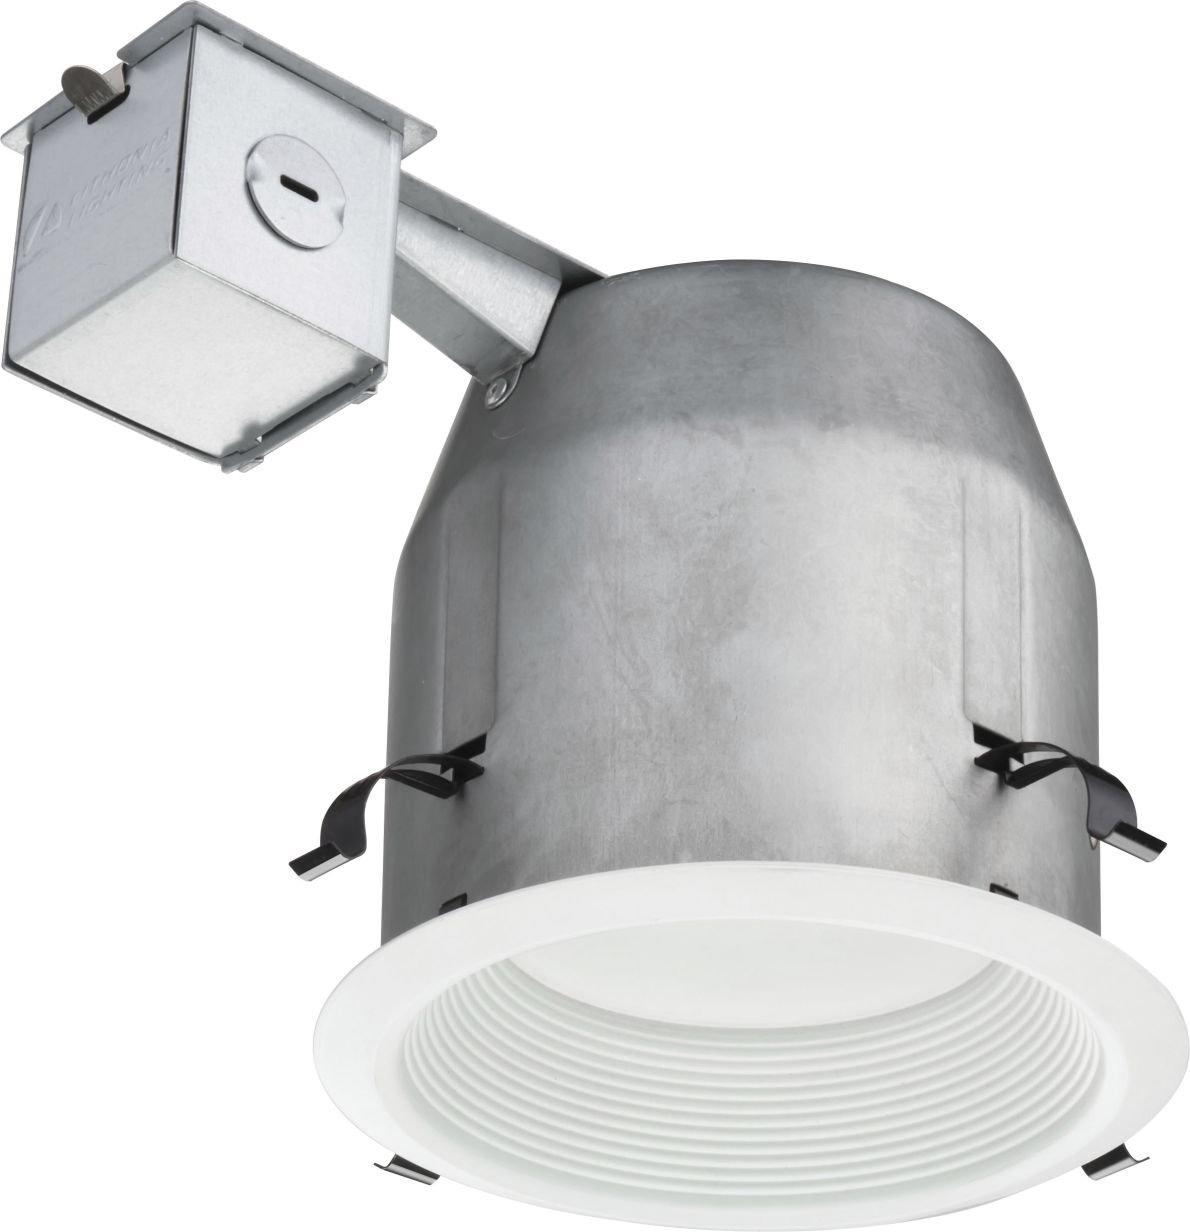 Lithonia Lighting LK5BPMW LED M4 Recessed Kit